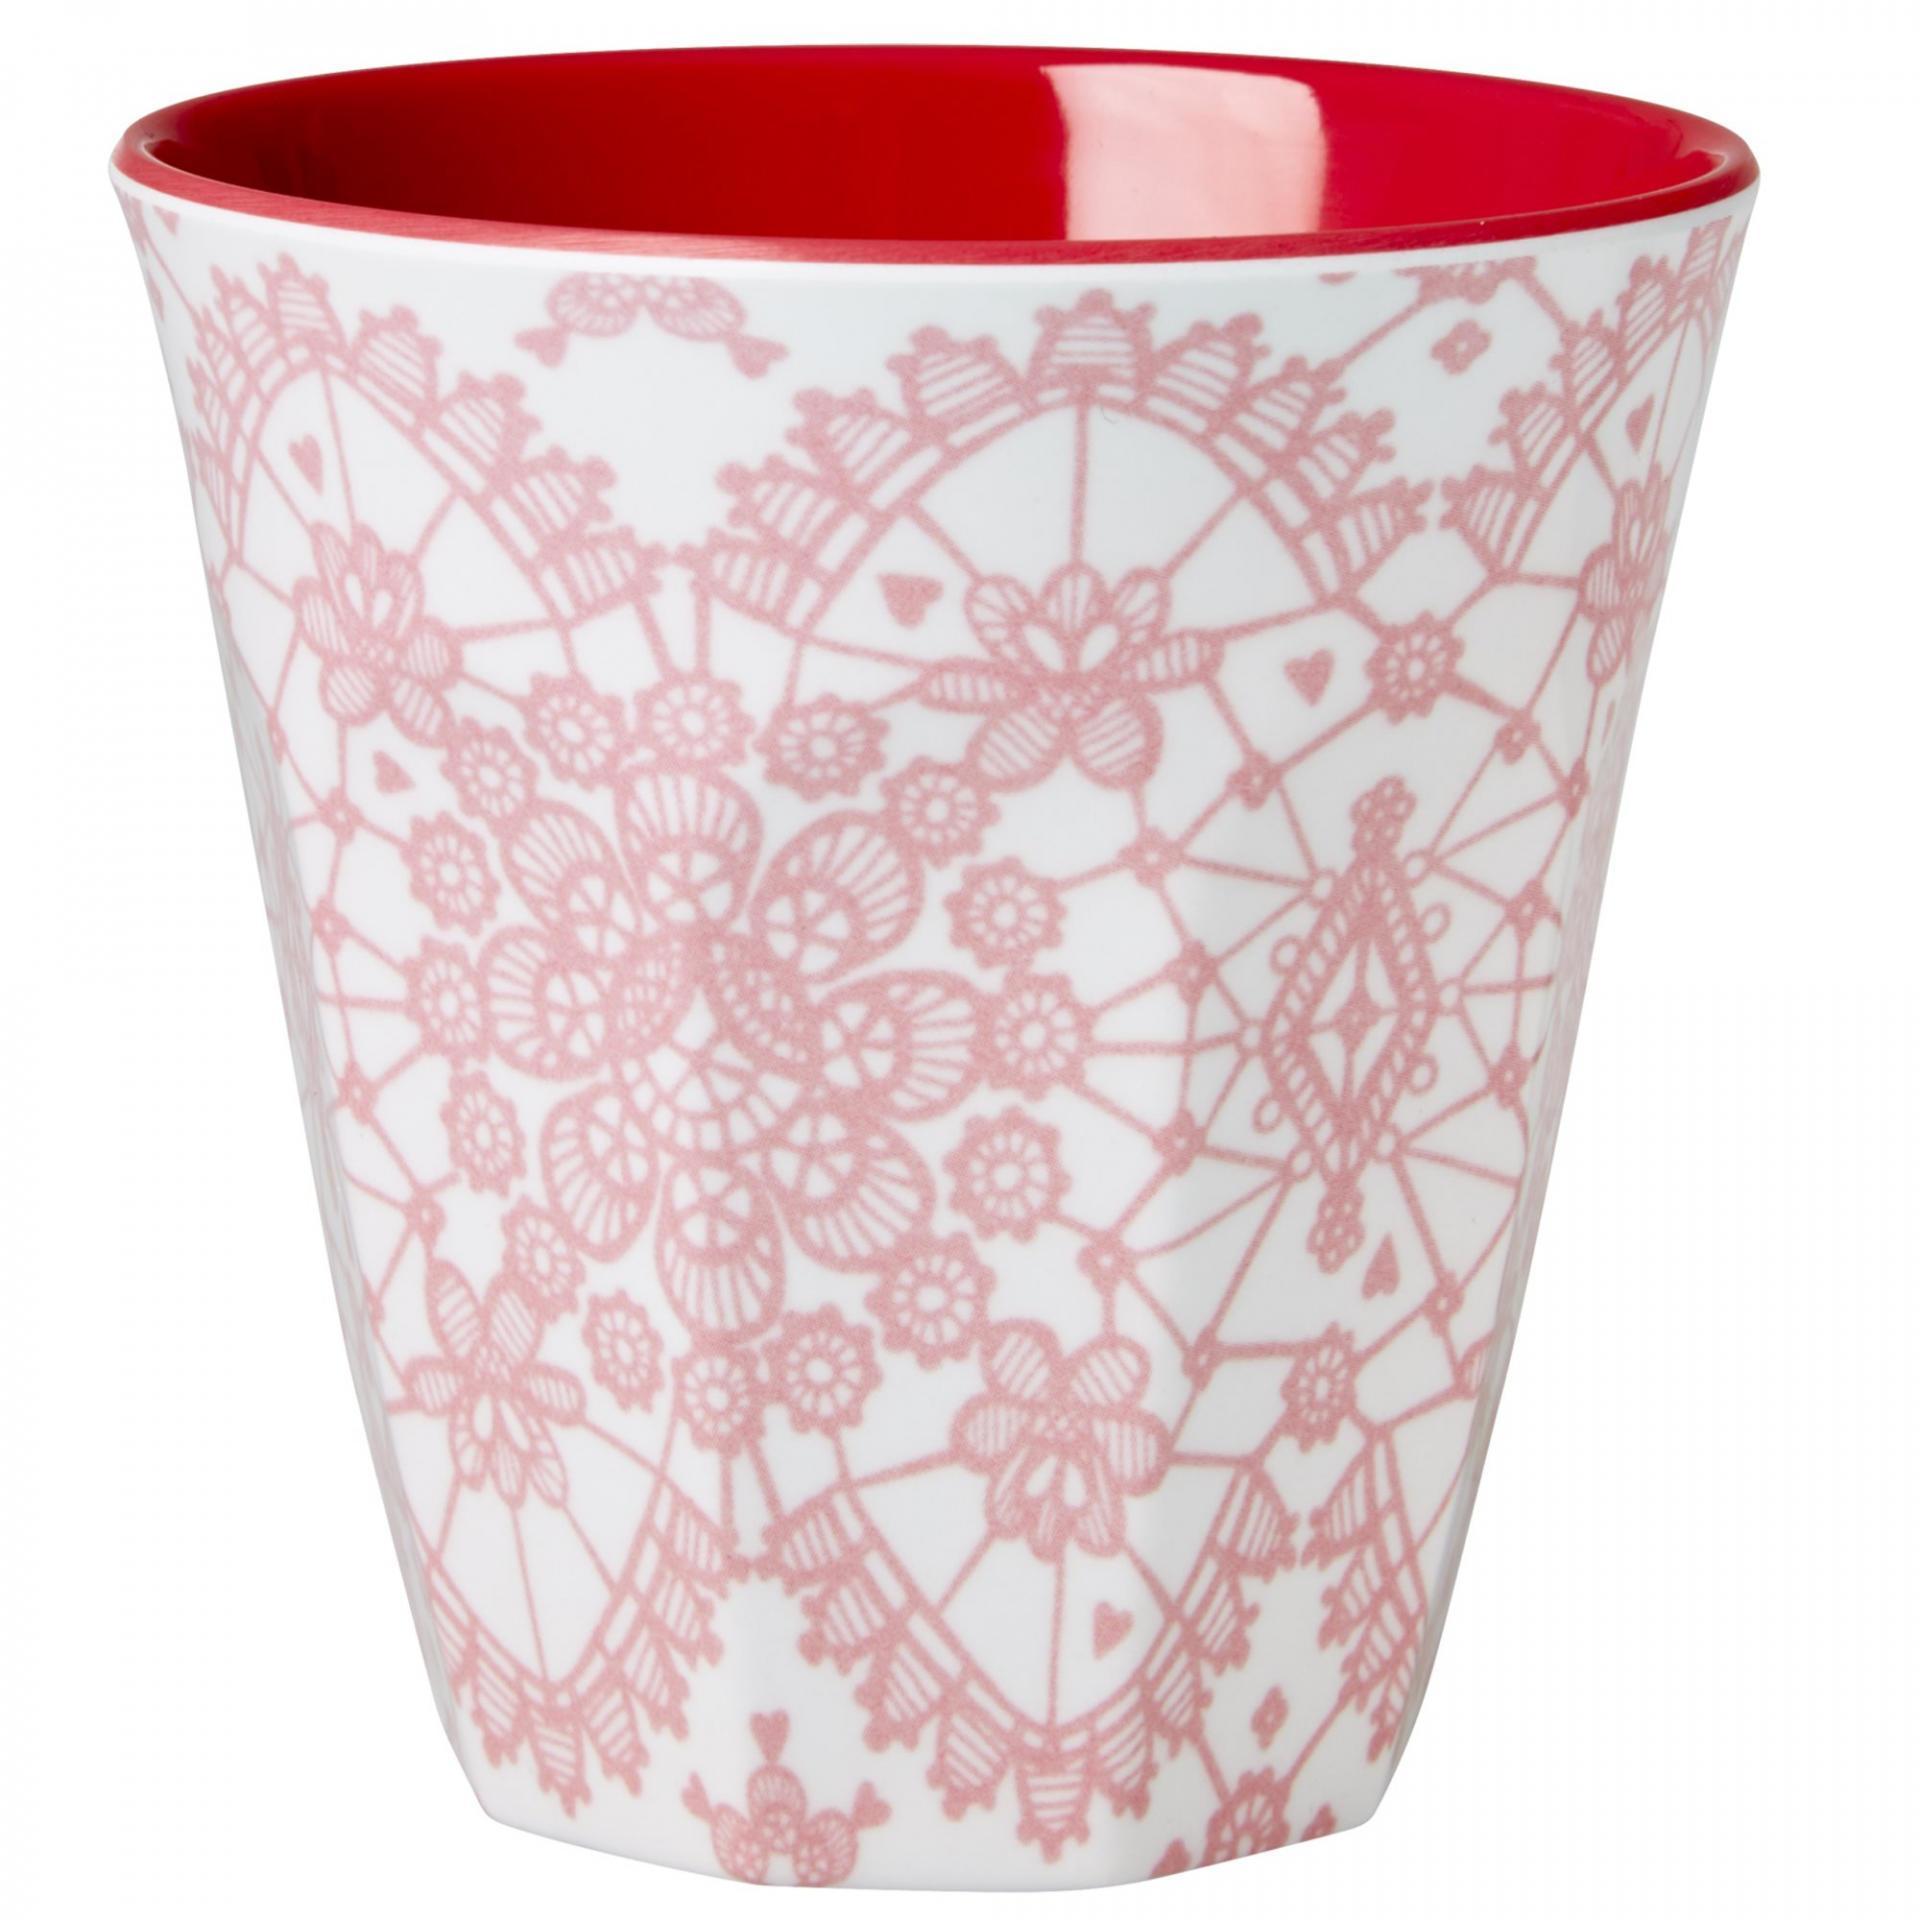 rice Melaminový pohárek Lace red, červená barva, růžová barva, melamin